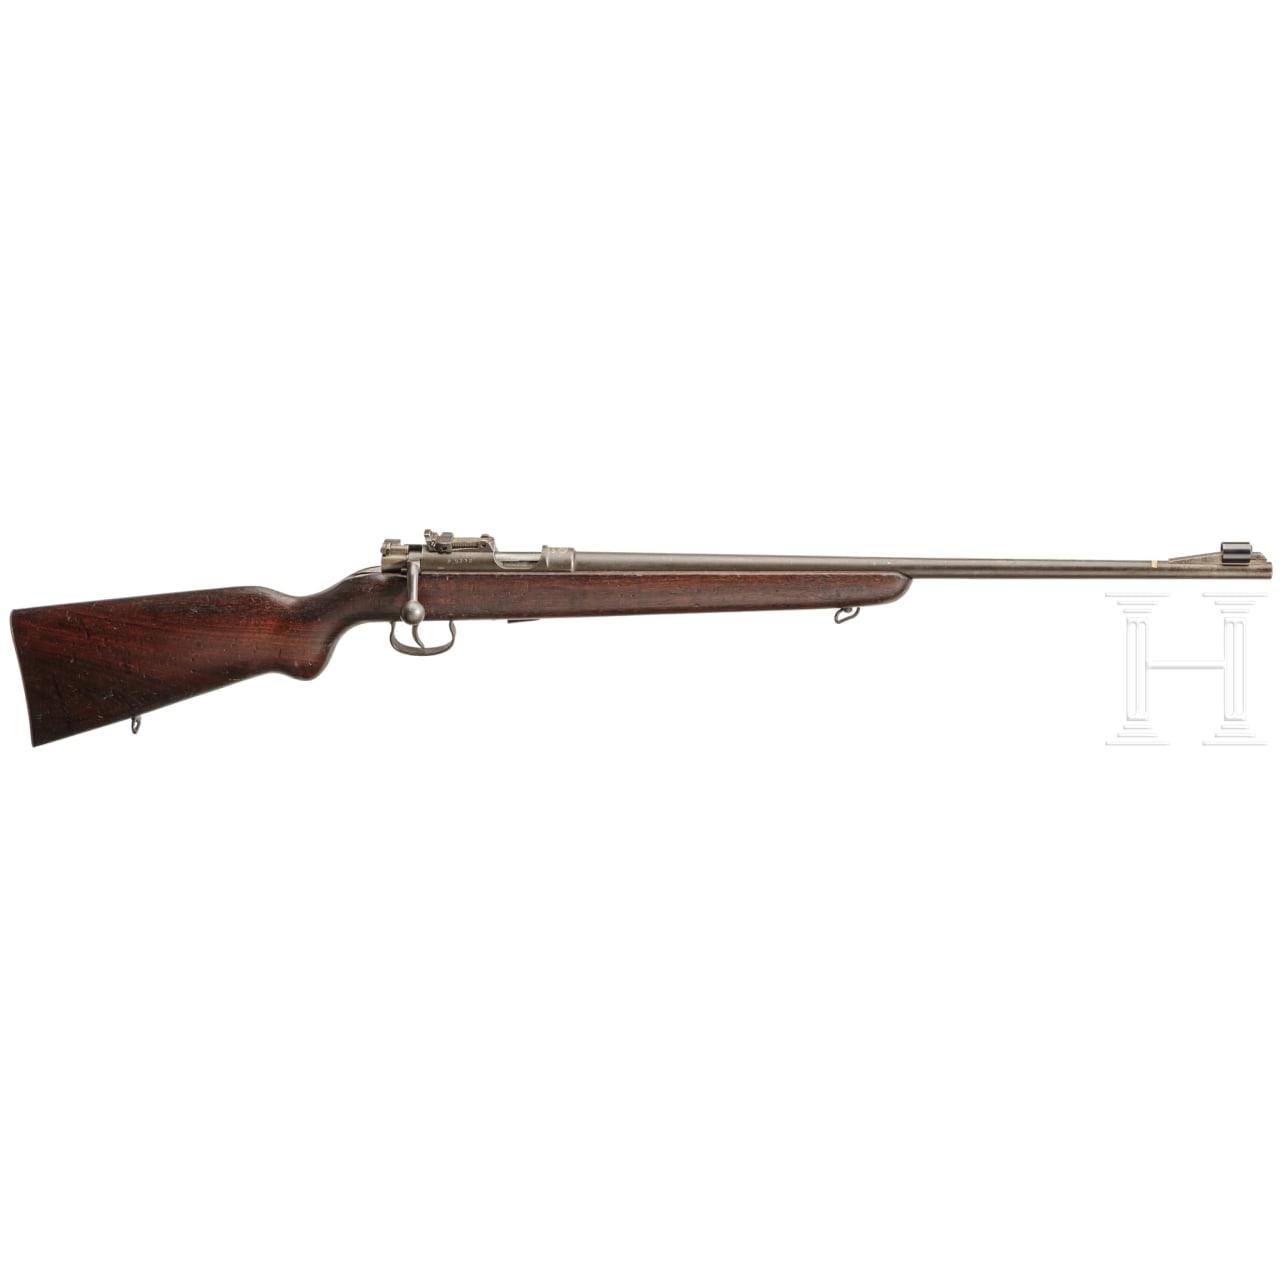 Wehrsportgewehr MAS-Mauser Mod. 45